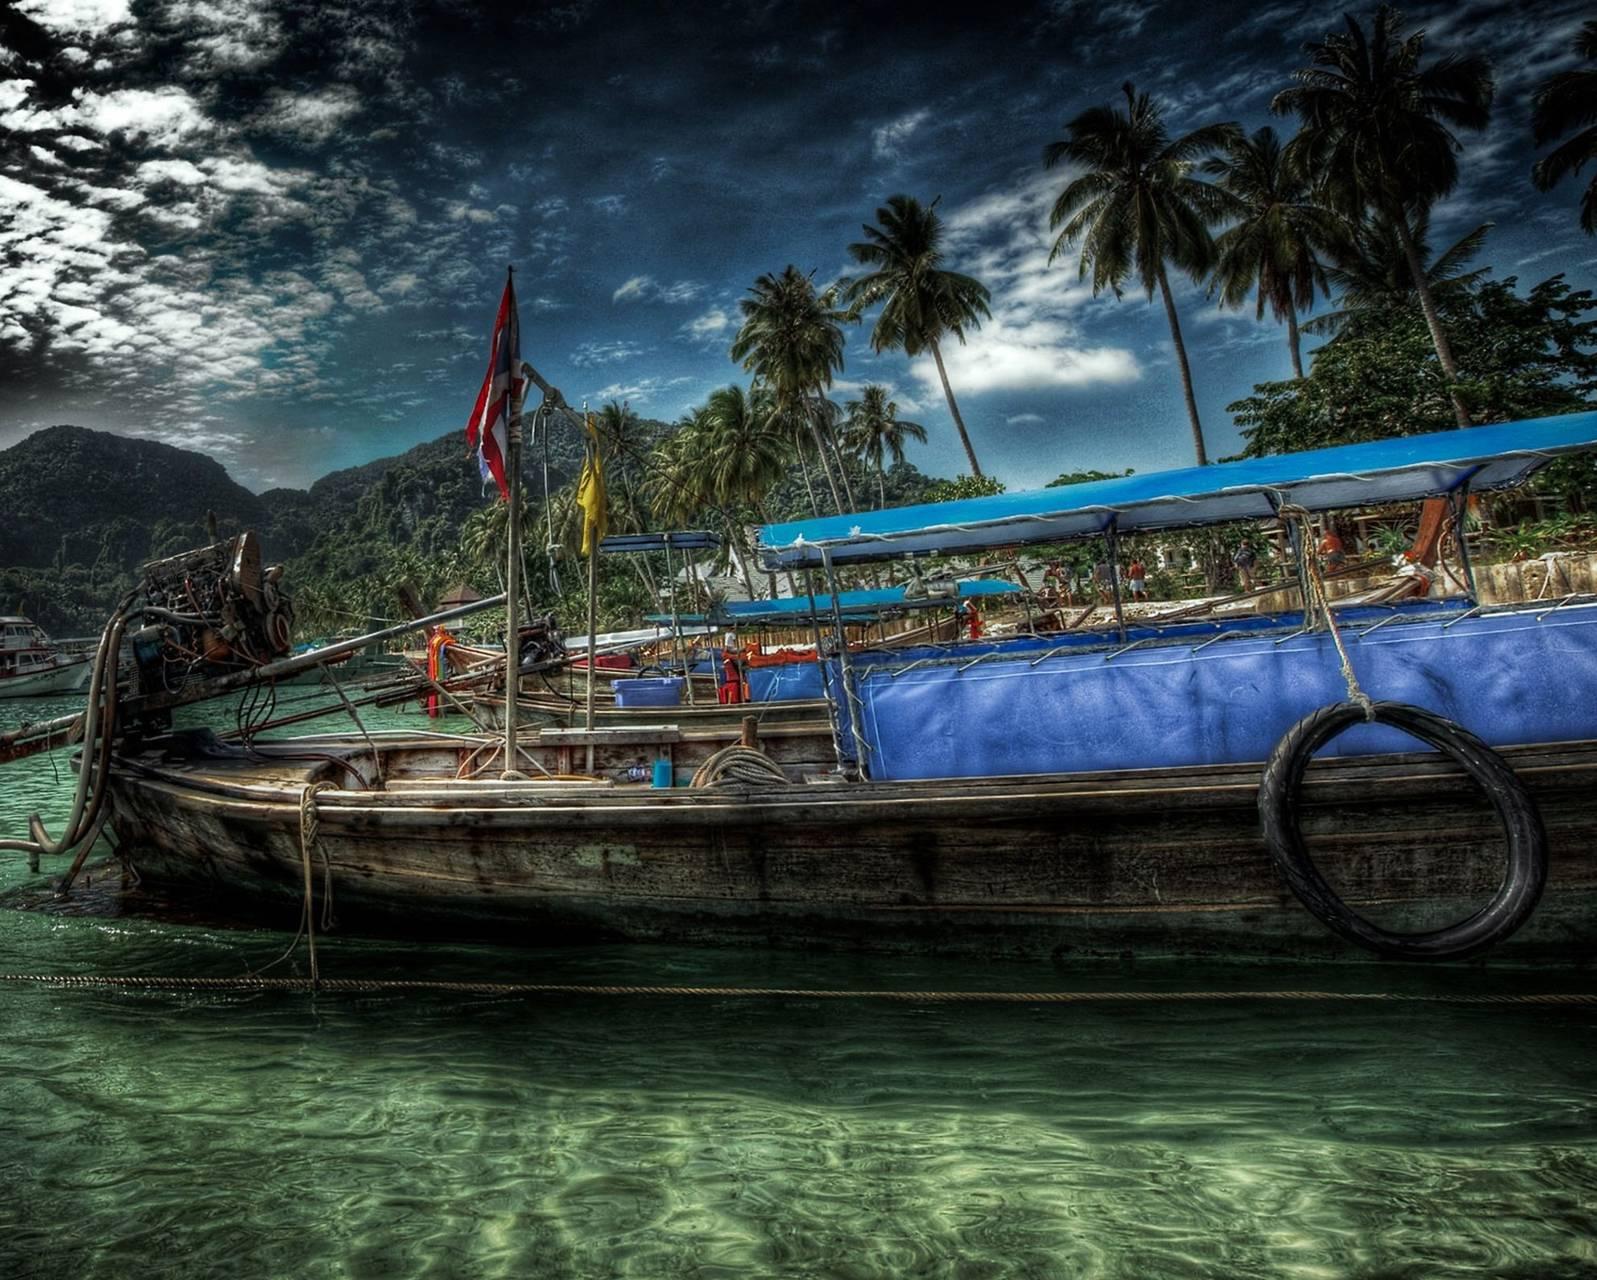 Hd Boat